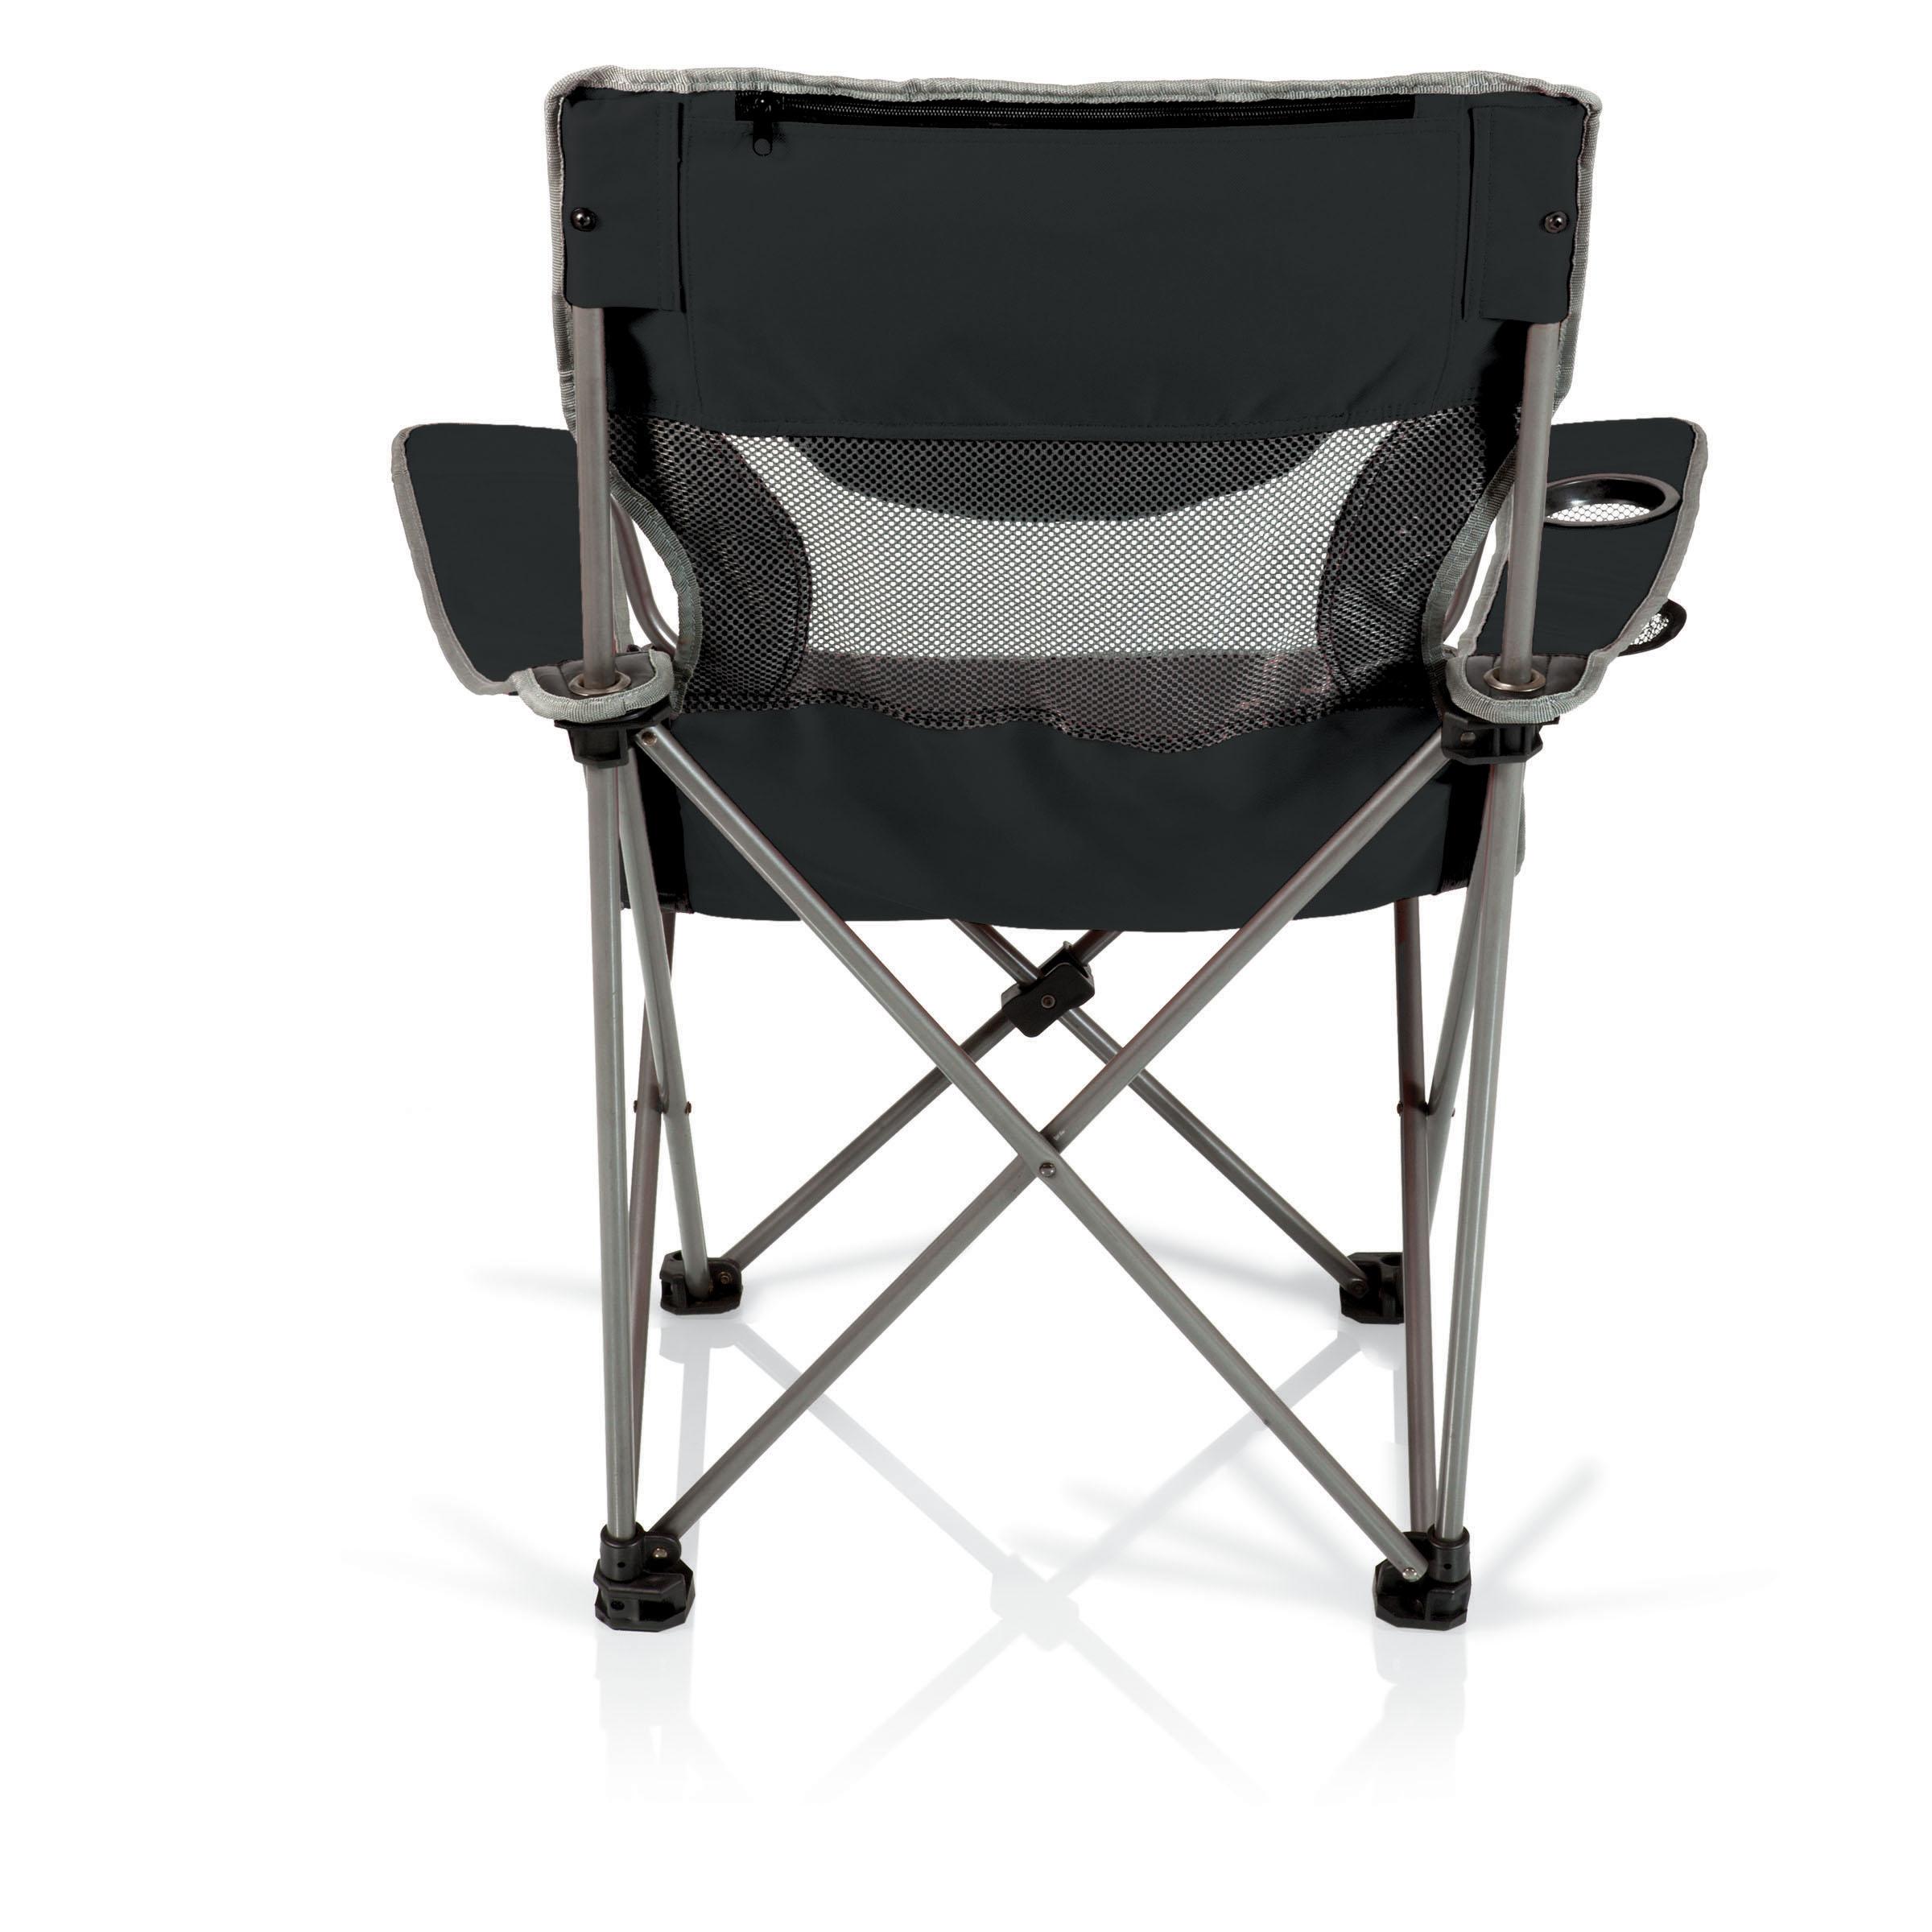 Picnic Time Campsite Folding Camp Chair  BlackGrey